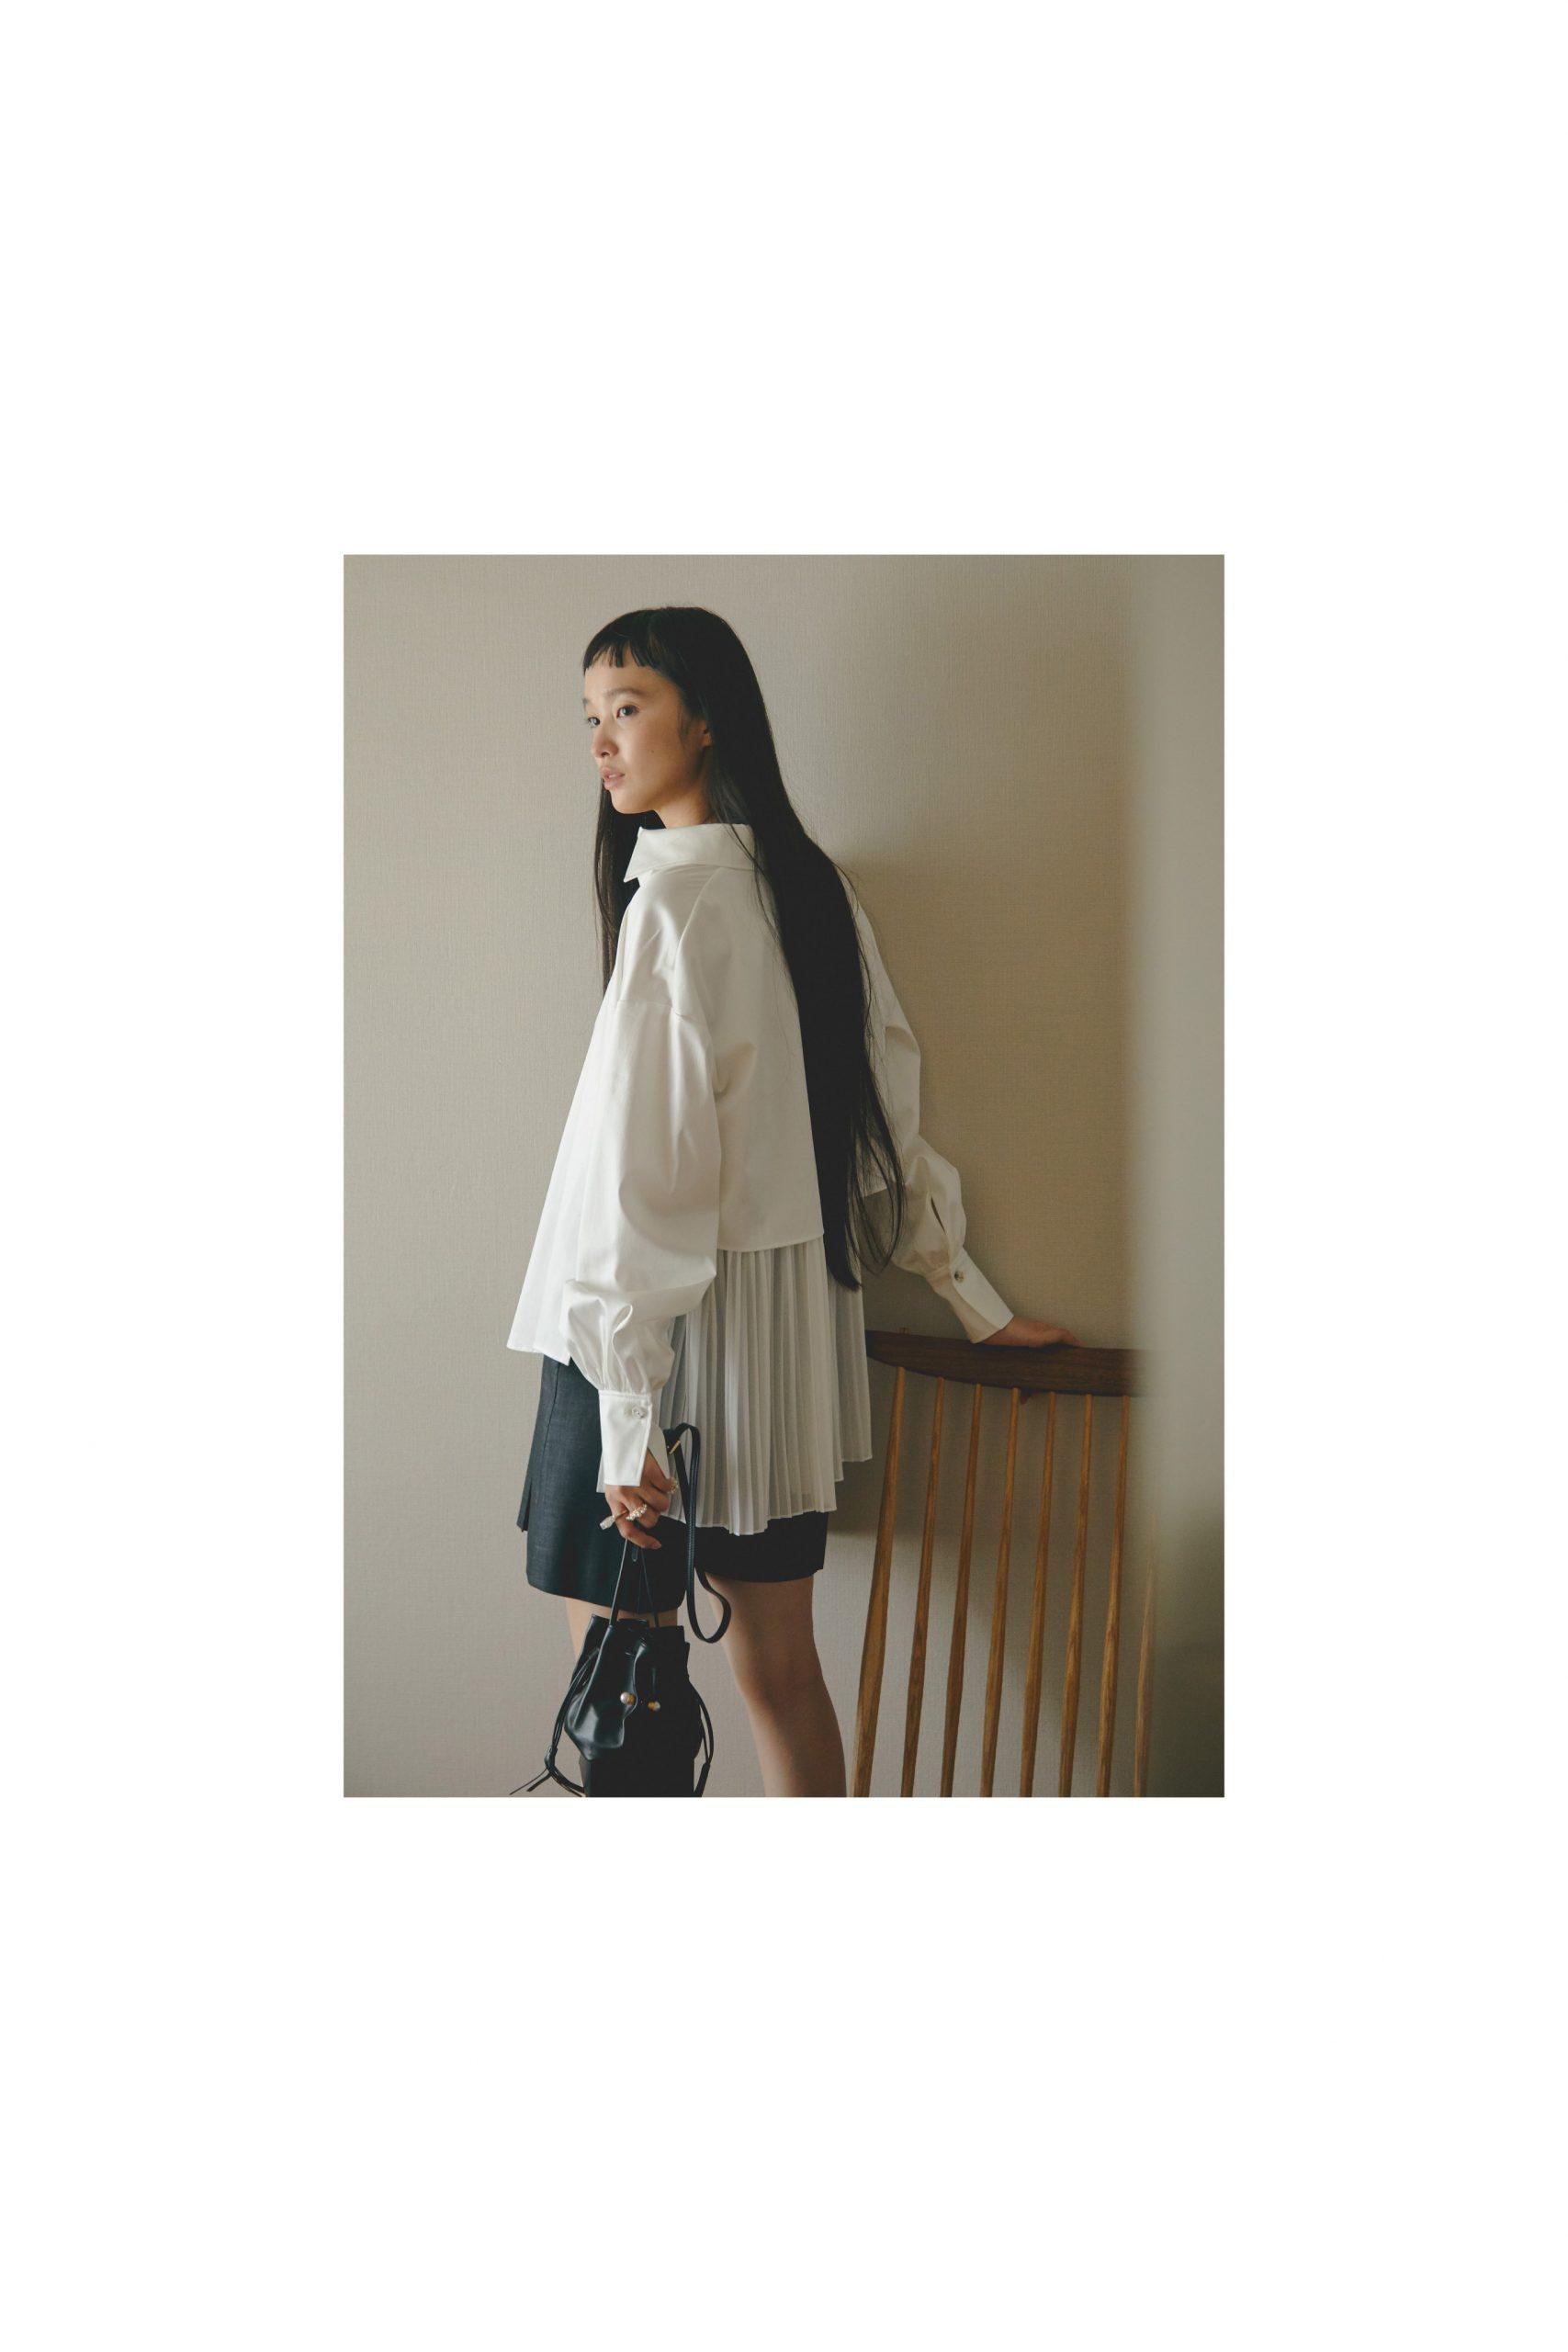 Adeam Resort 2021 Fashion Collection Photos